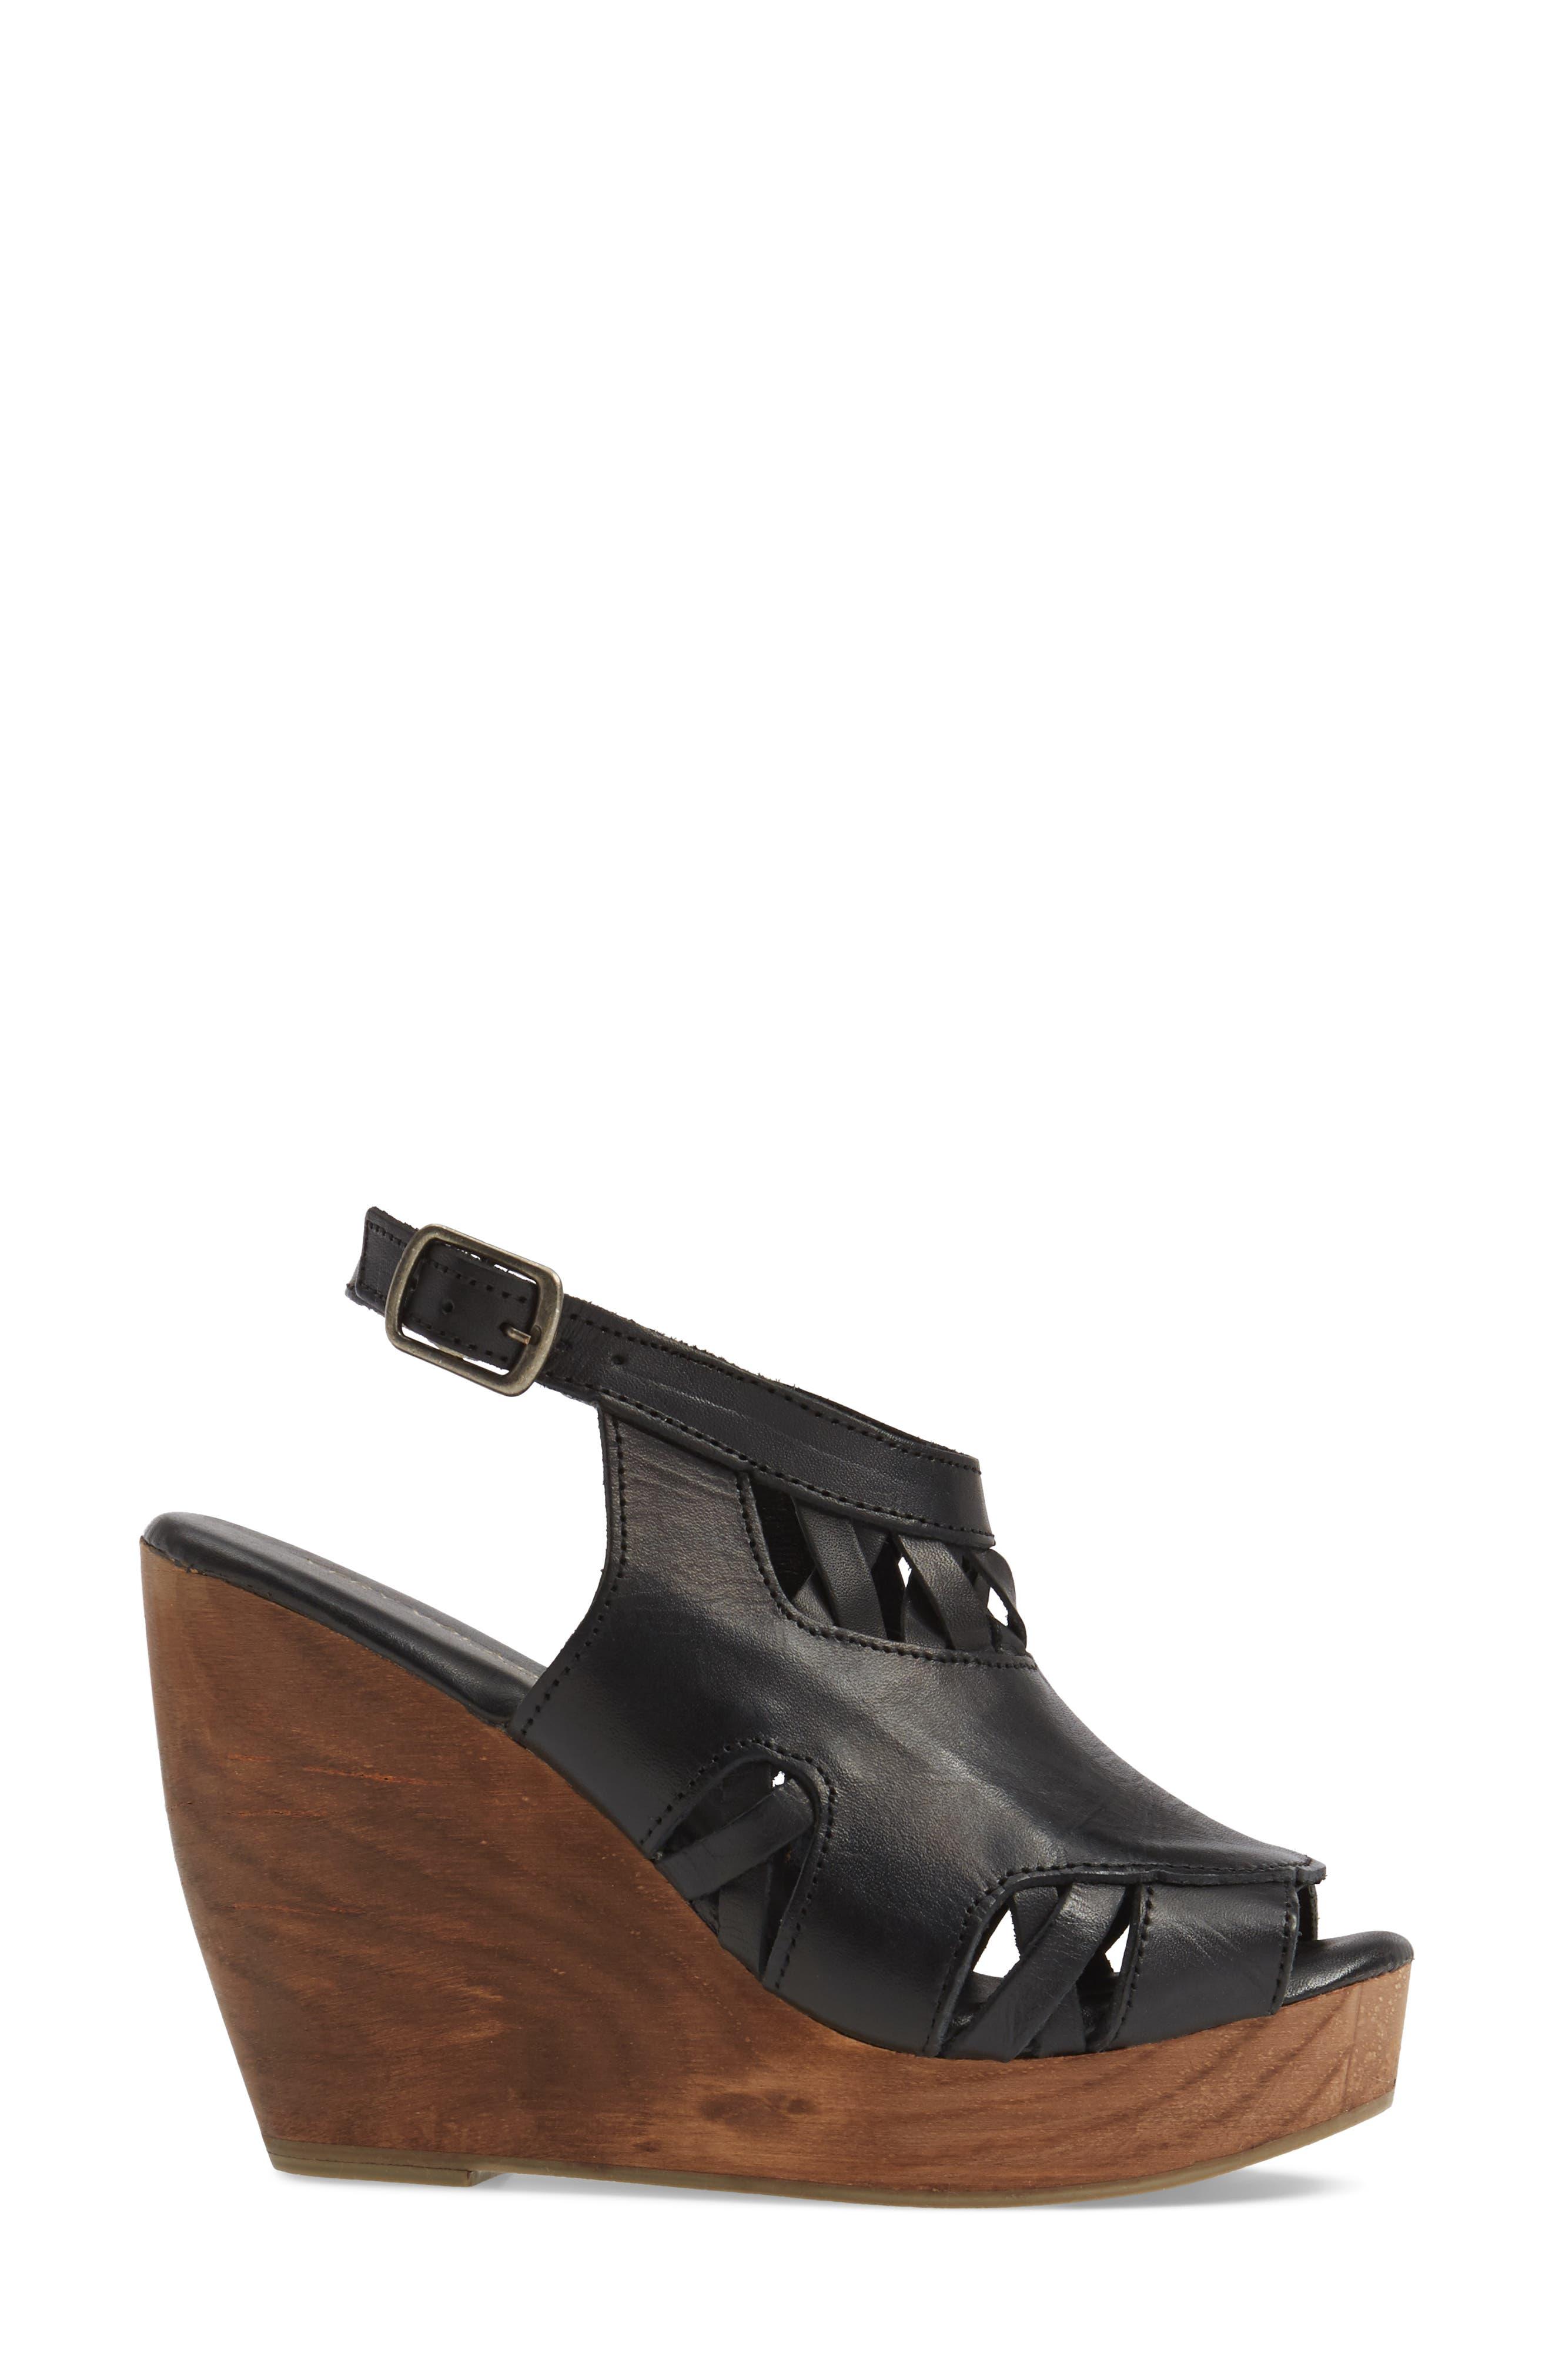 Sloane Platform Wedge Sandal,                             Alternate thumbnail 5, color,